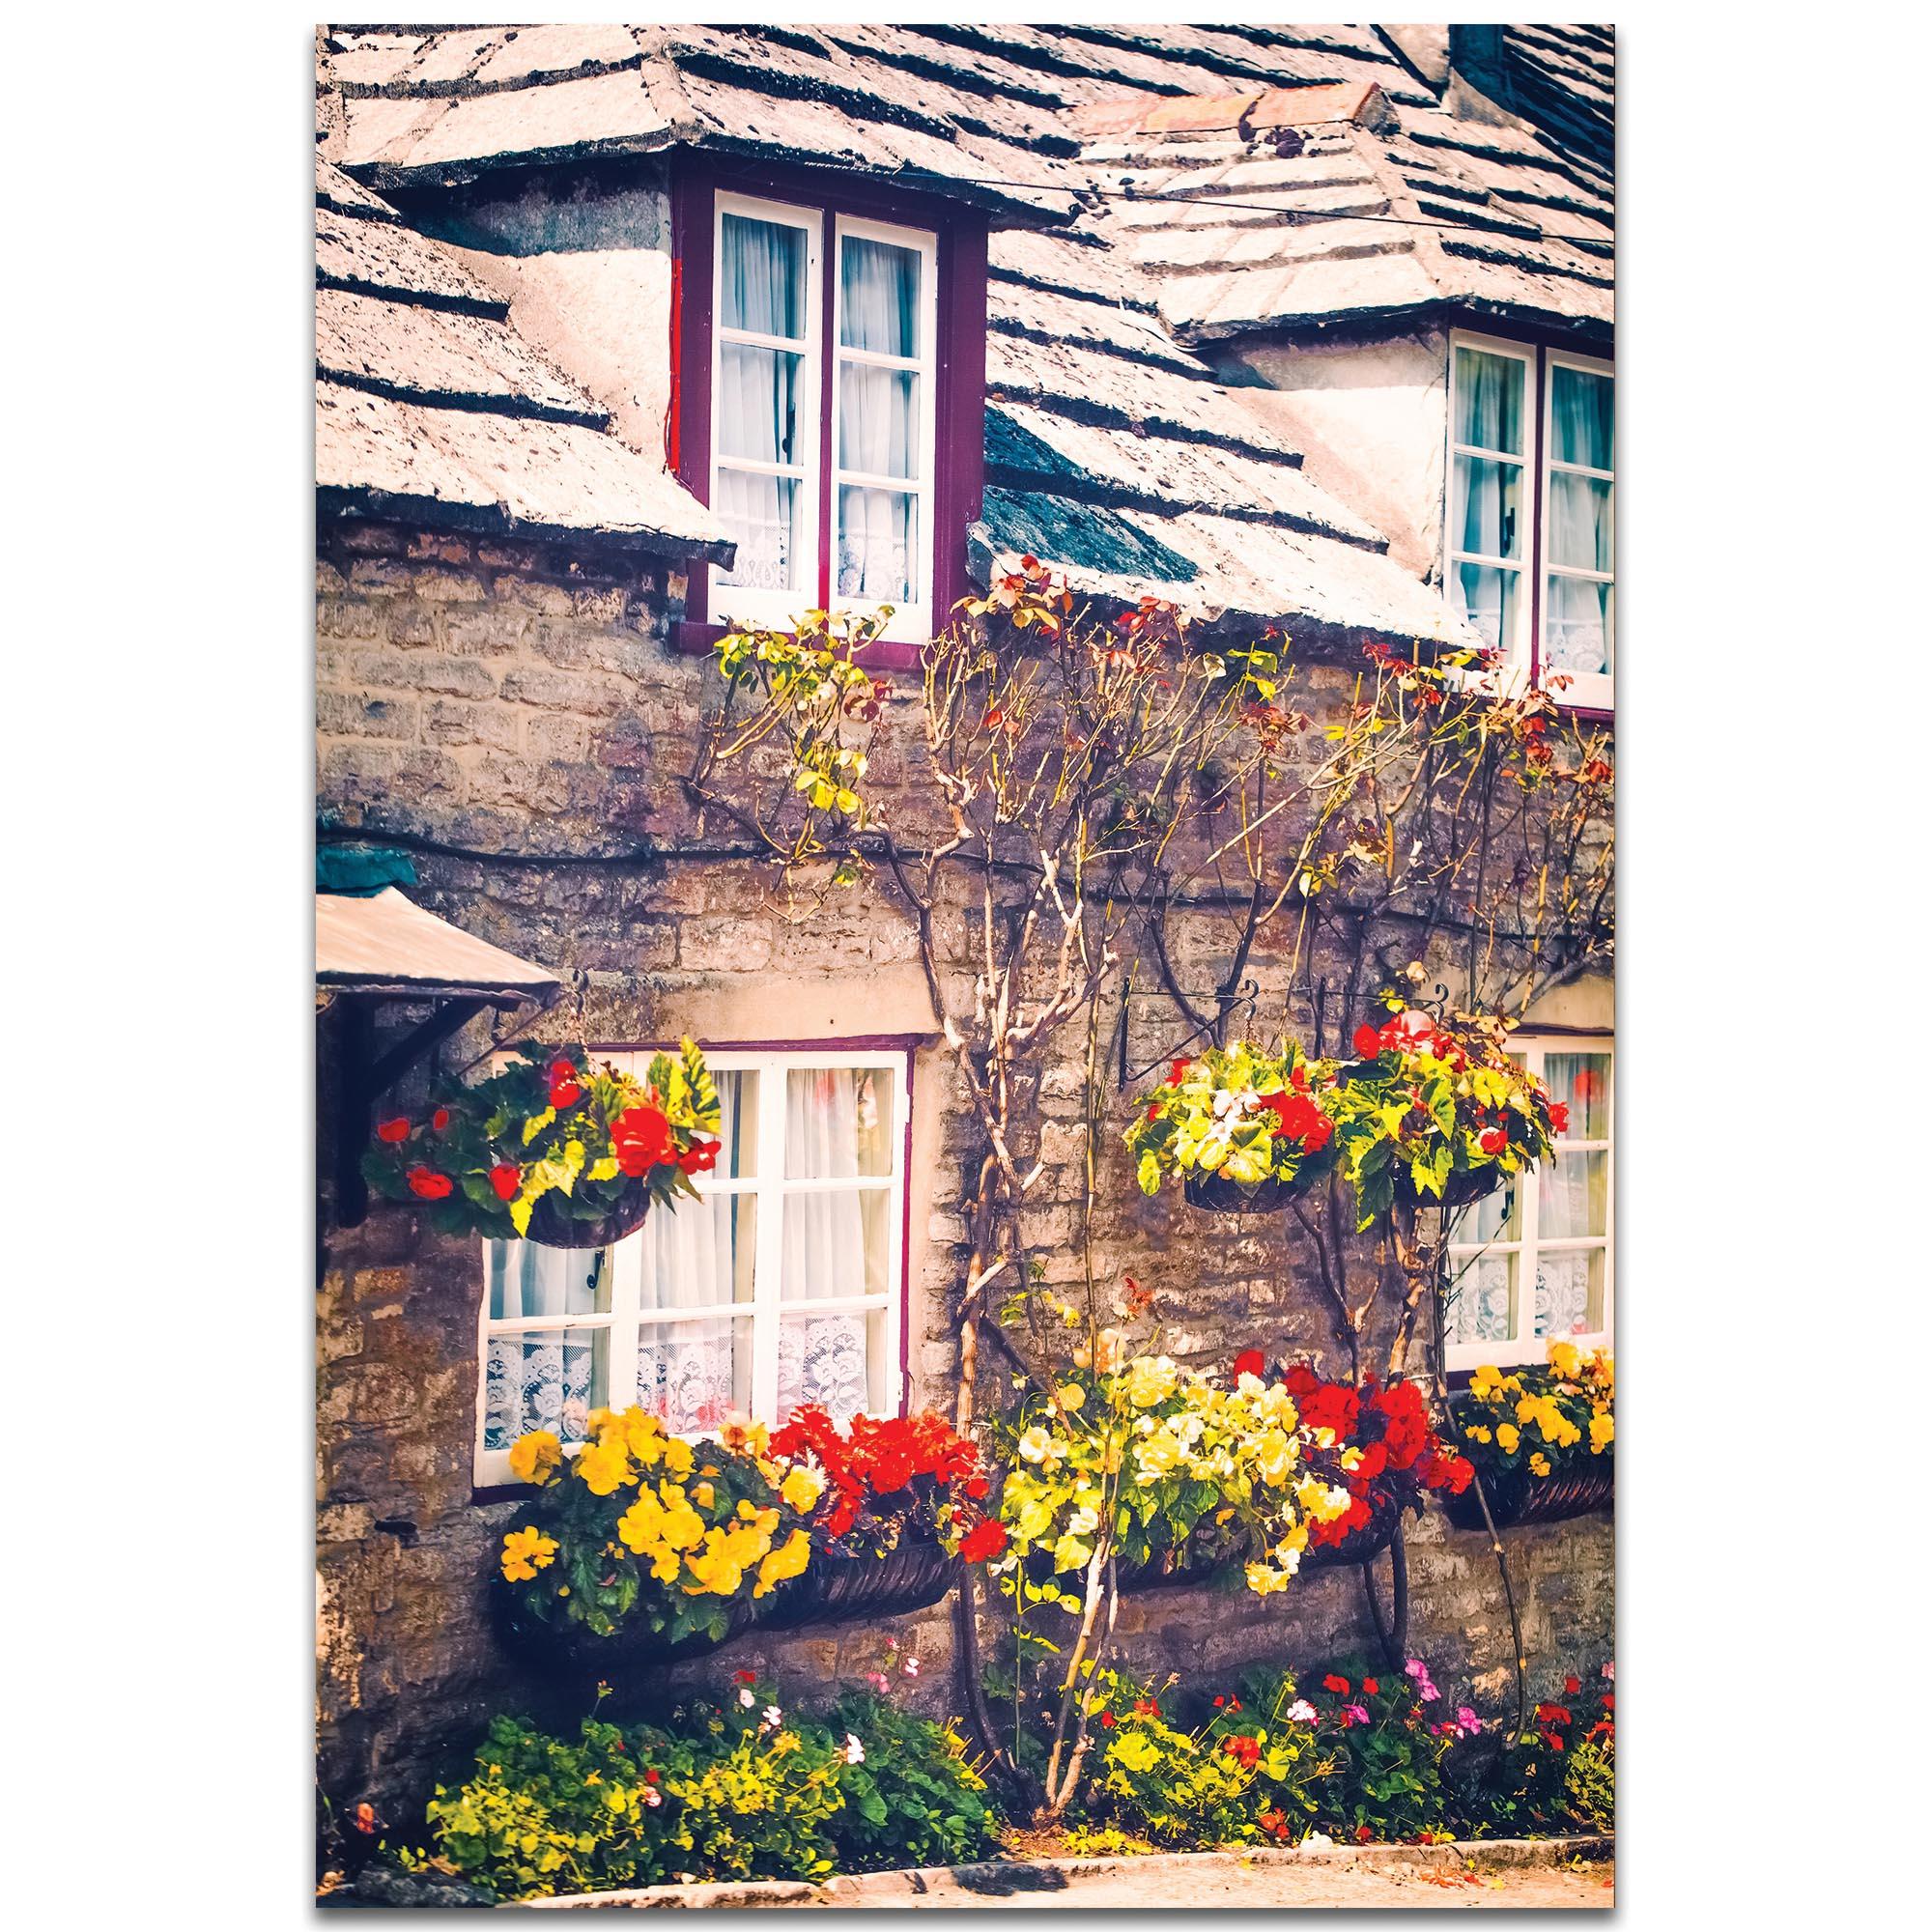 Cottage Wall Art 'Flowered Bricks' - Brick House Decor on Metal or Plexiglass